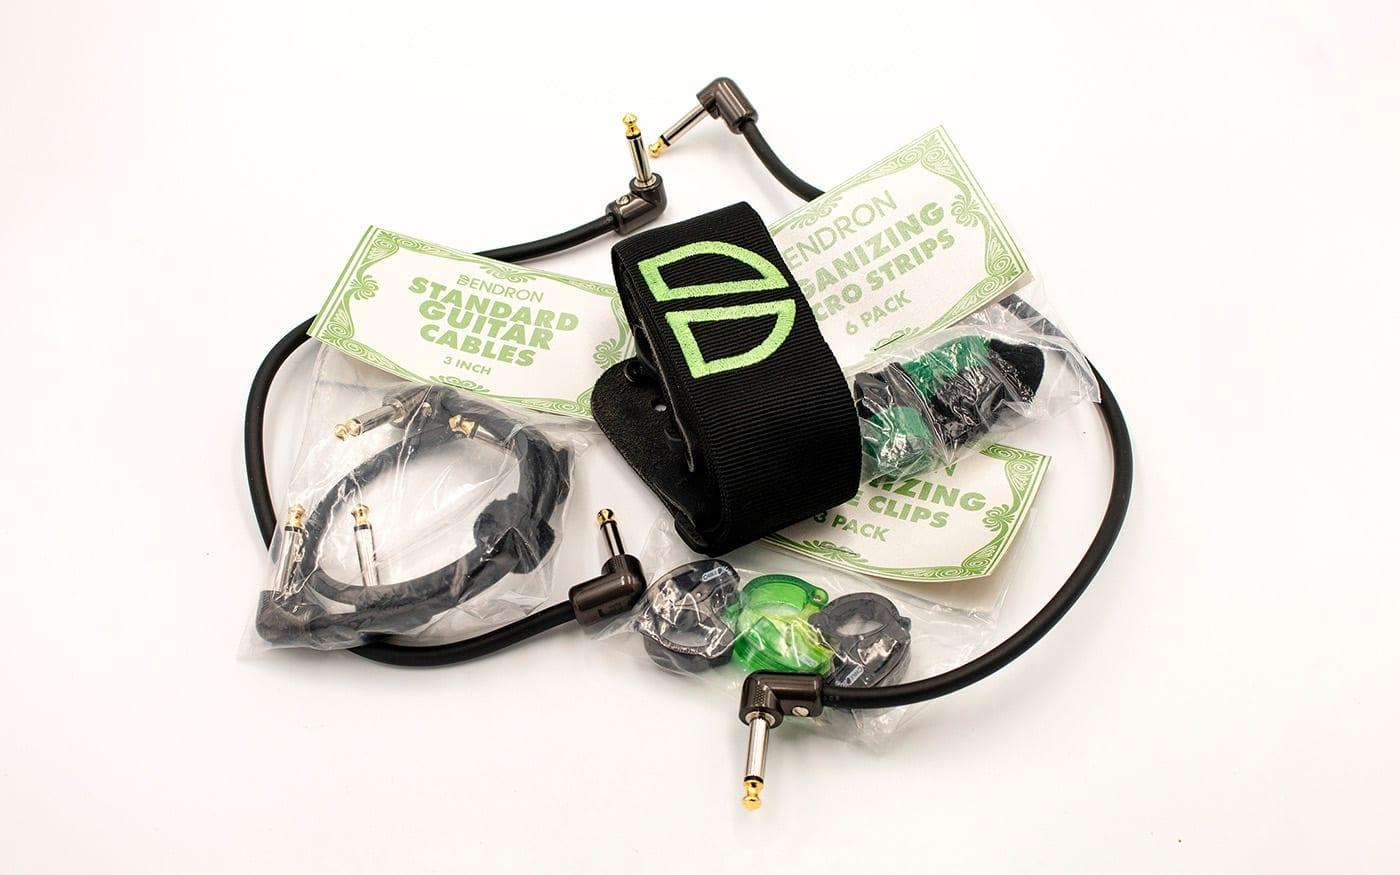 Dendron Pedal Board Kit